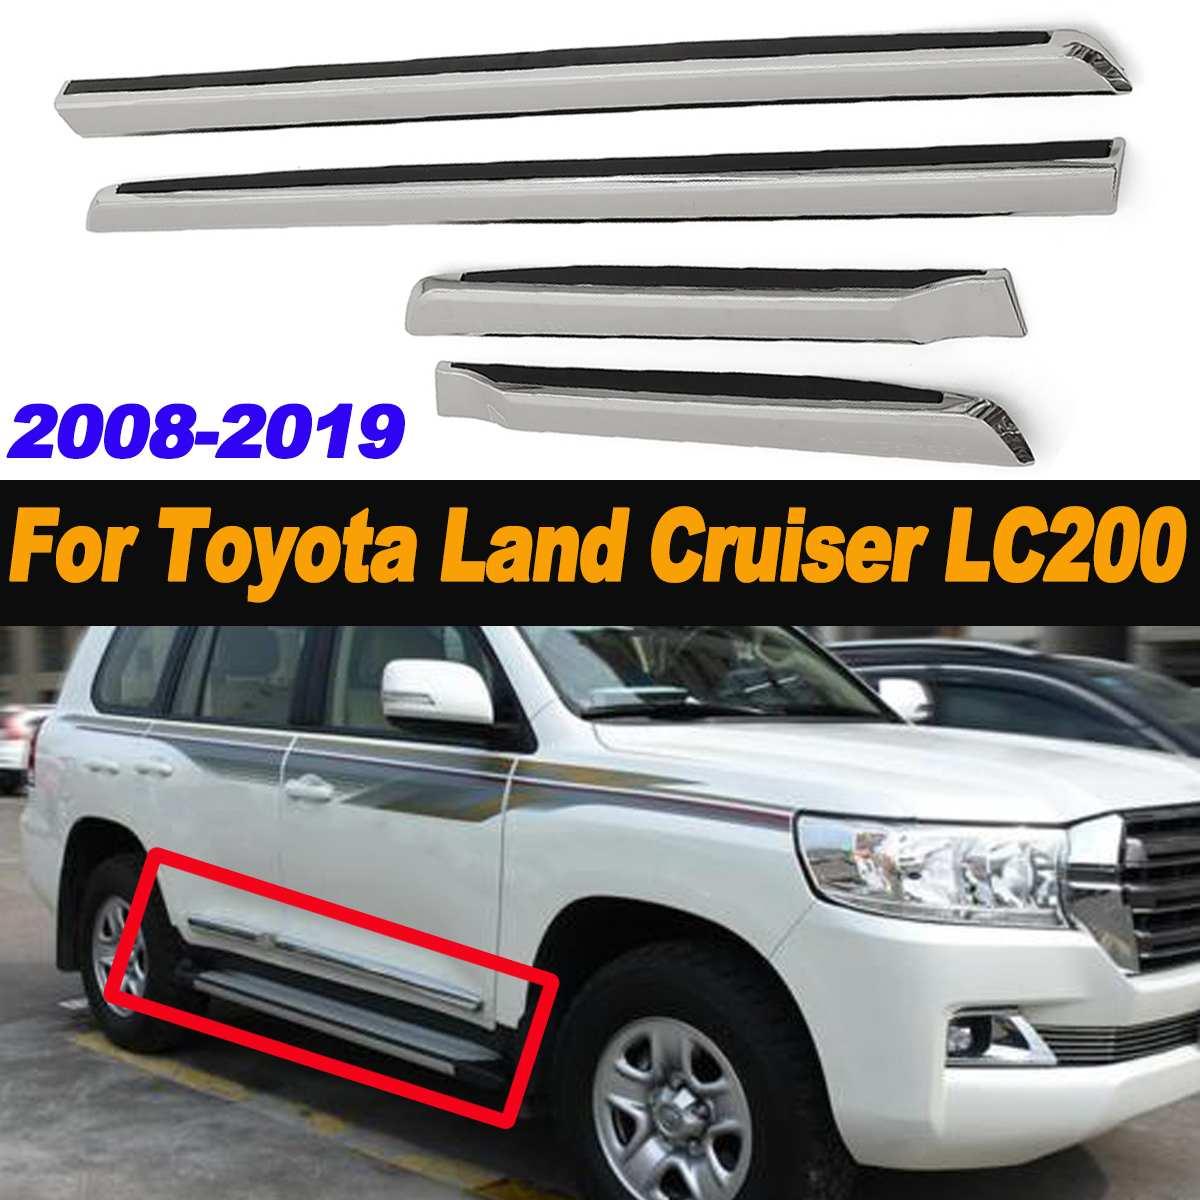 4 Uds. Moldura lateral de puerta cromada ABS línea de carrocería para Toyota para Land Cruiser LC200 2008-2019 estilo cromado